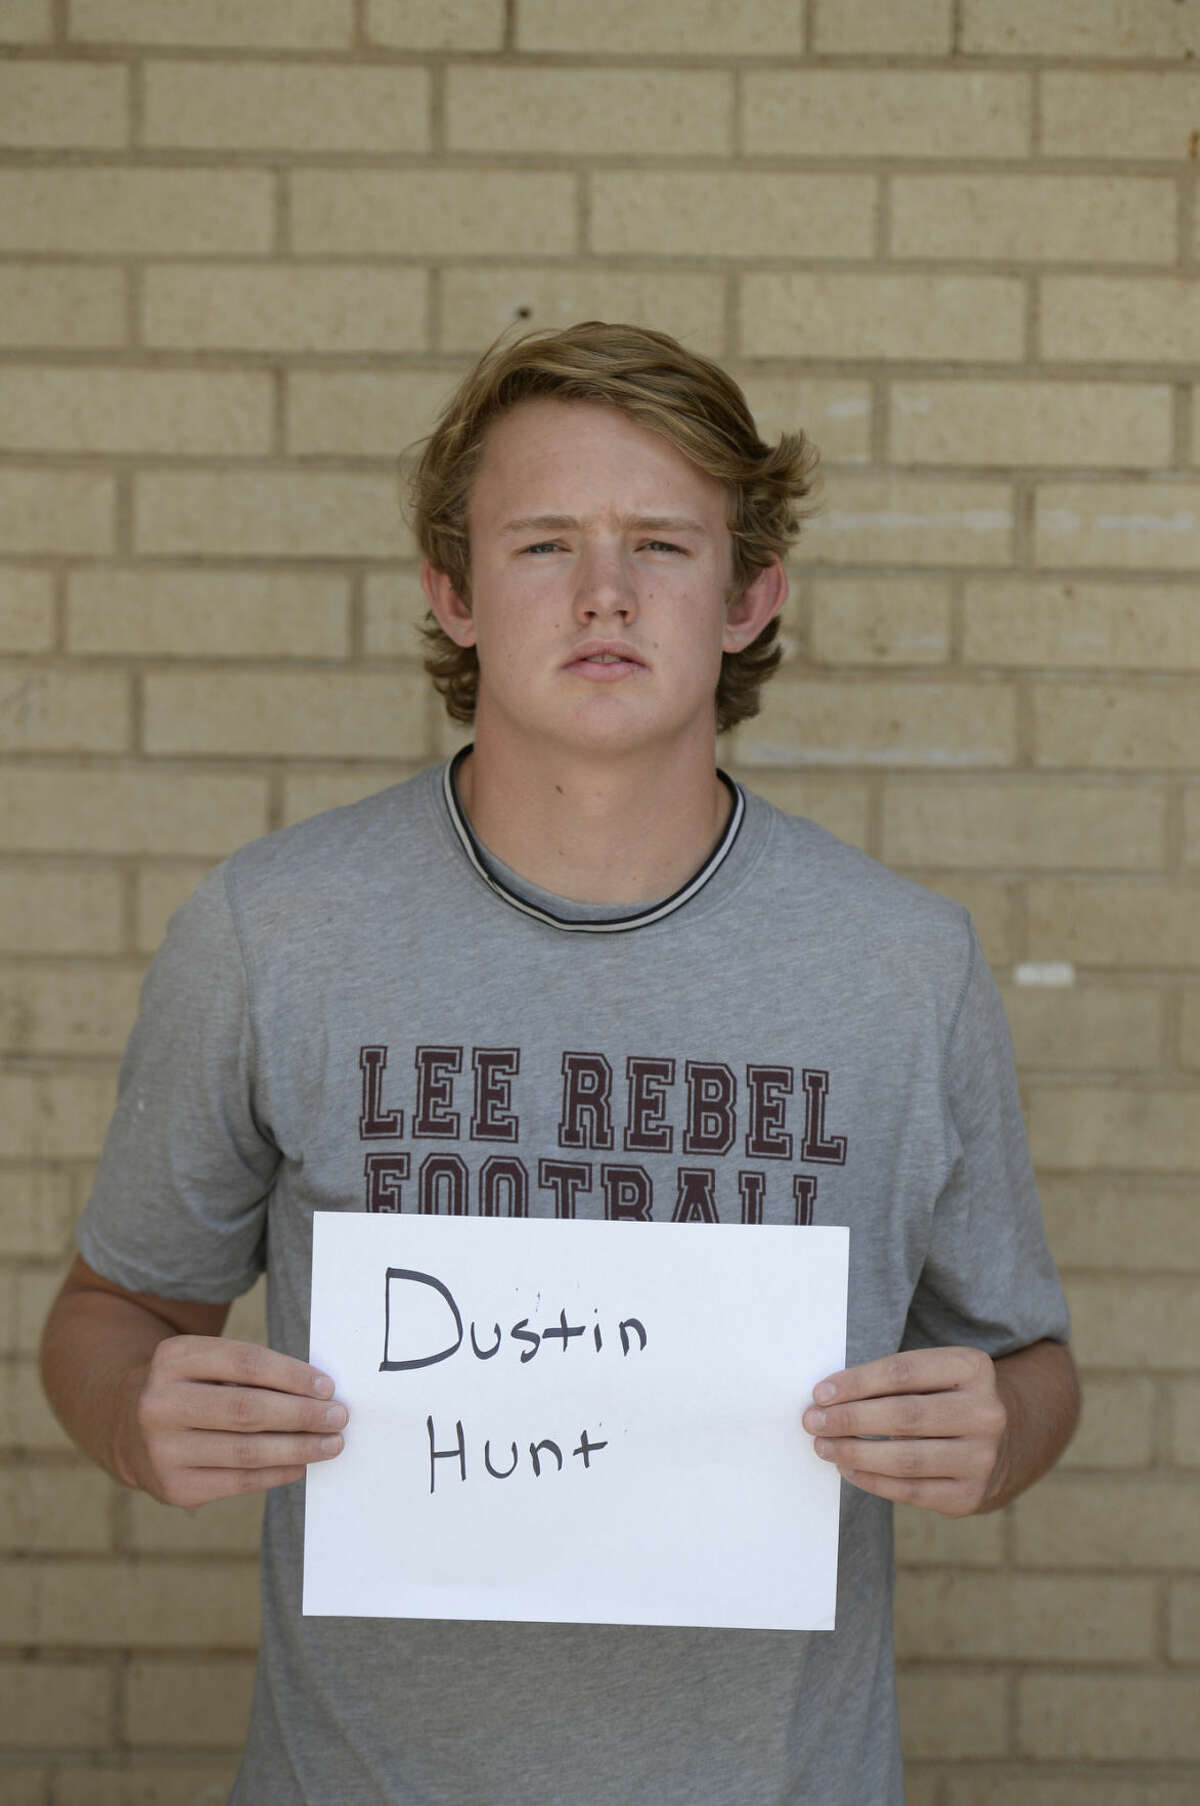 Lee High School football mugs 2015 - Dustin Hunt James Durbin/Reporter-Telegram